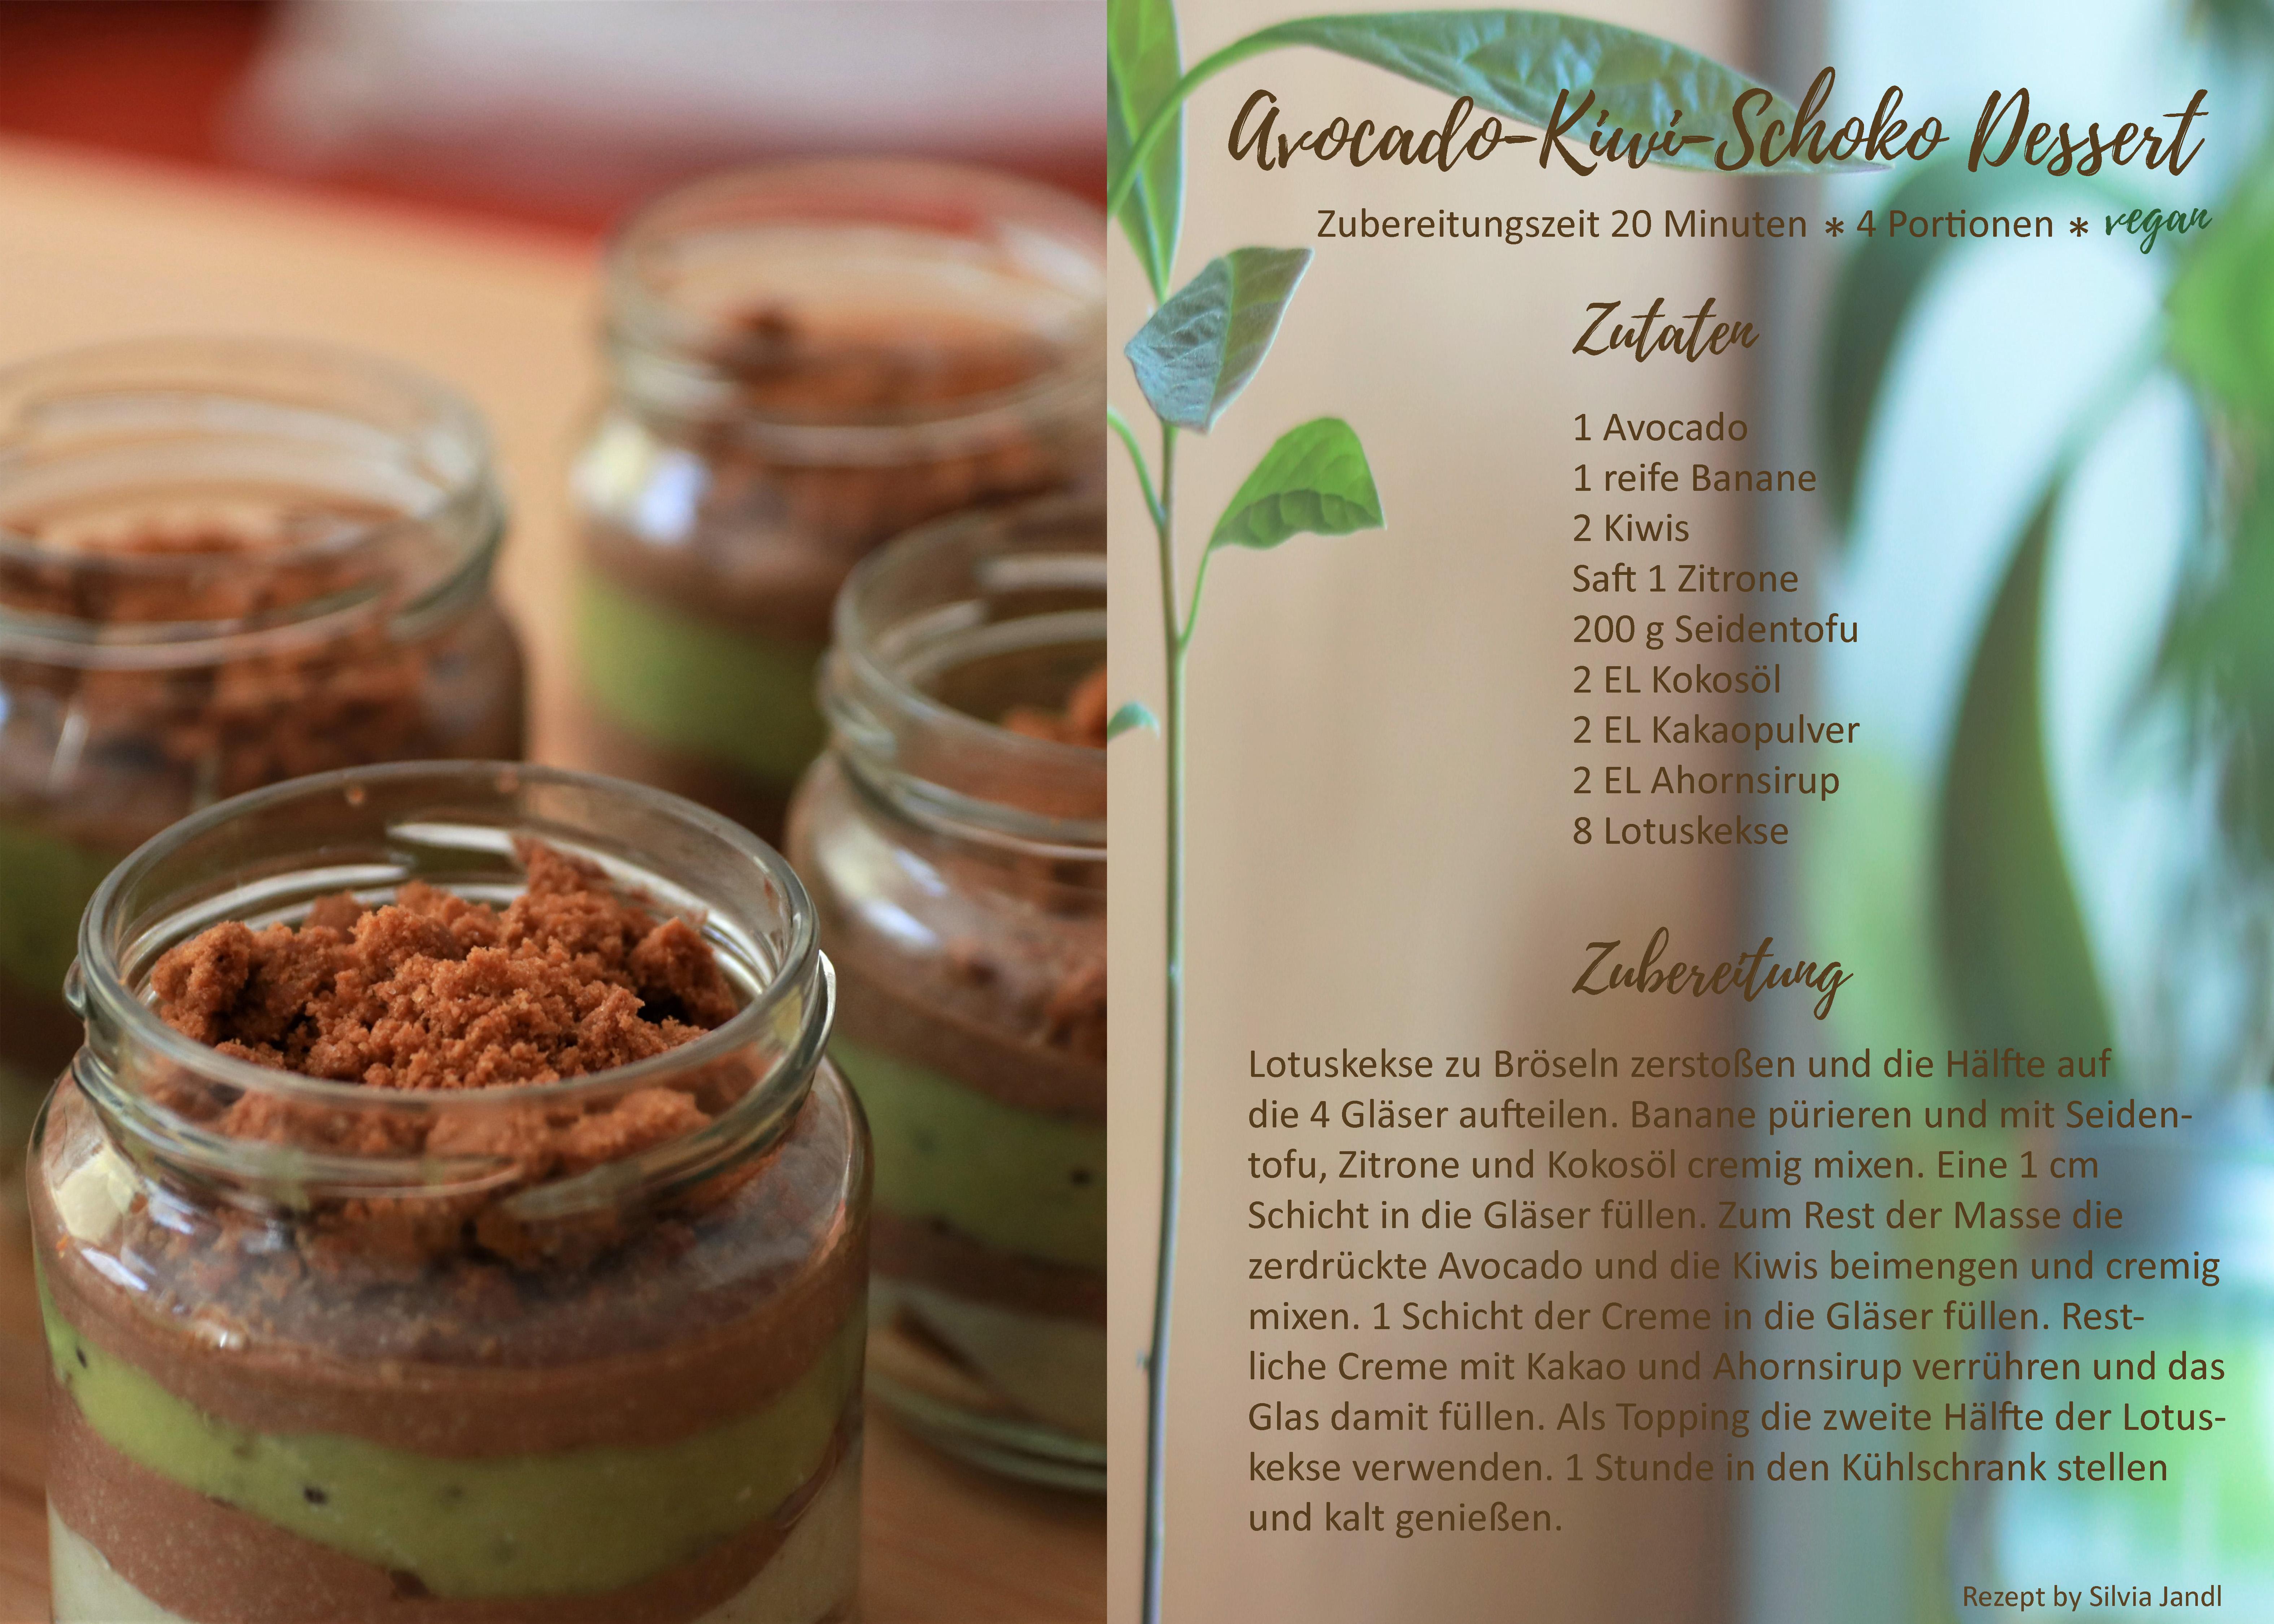 Avocado-Kiwi-Schoko Dessert vegan